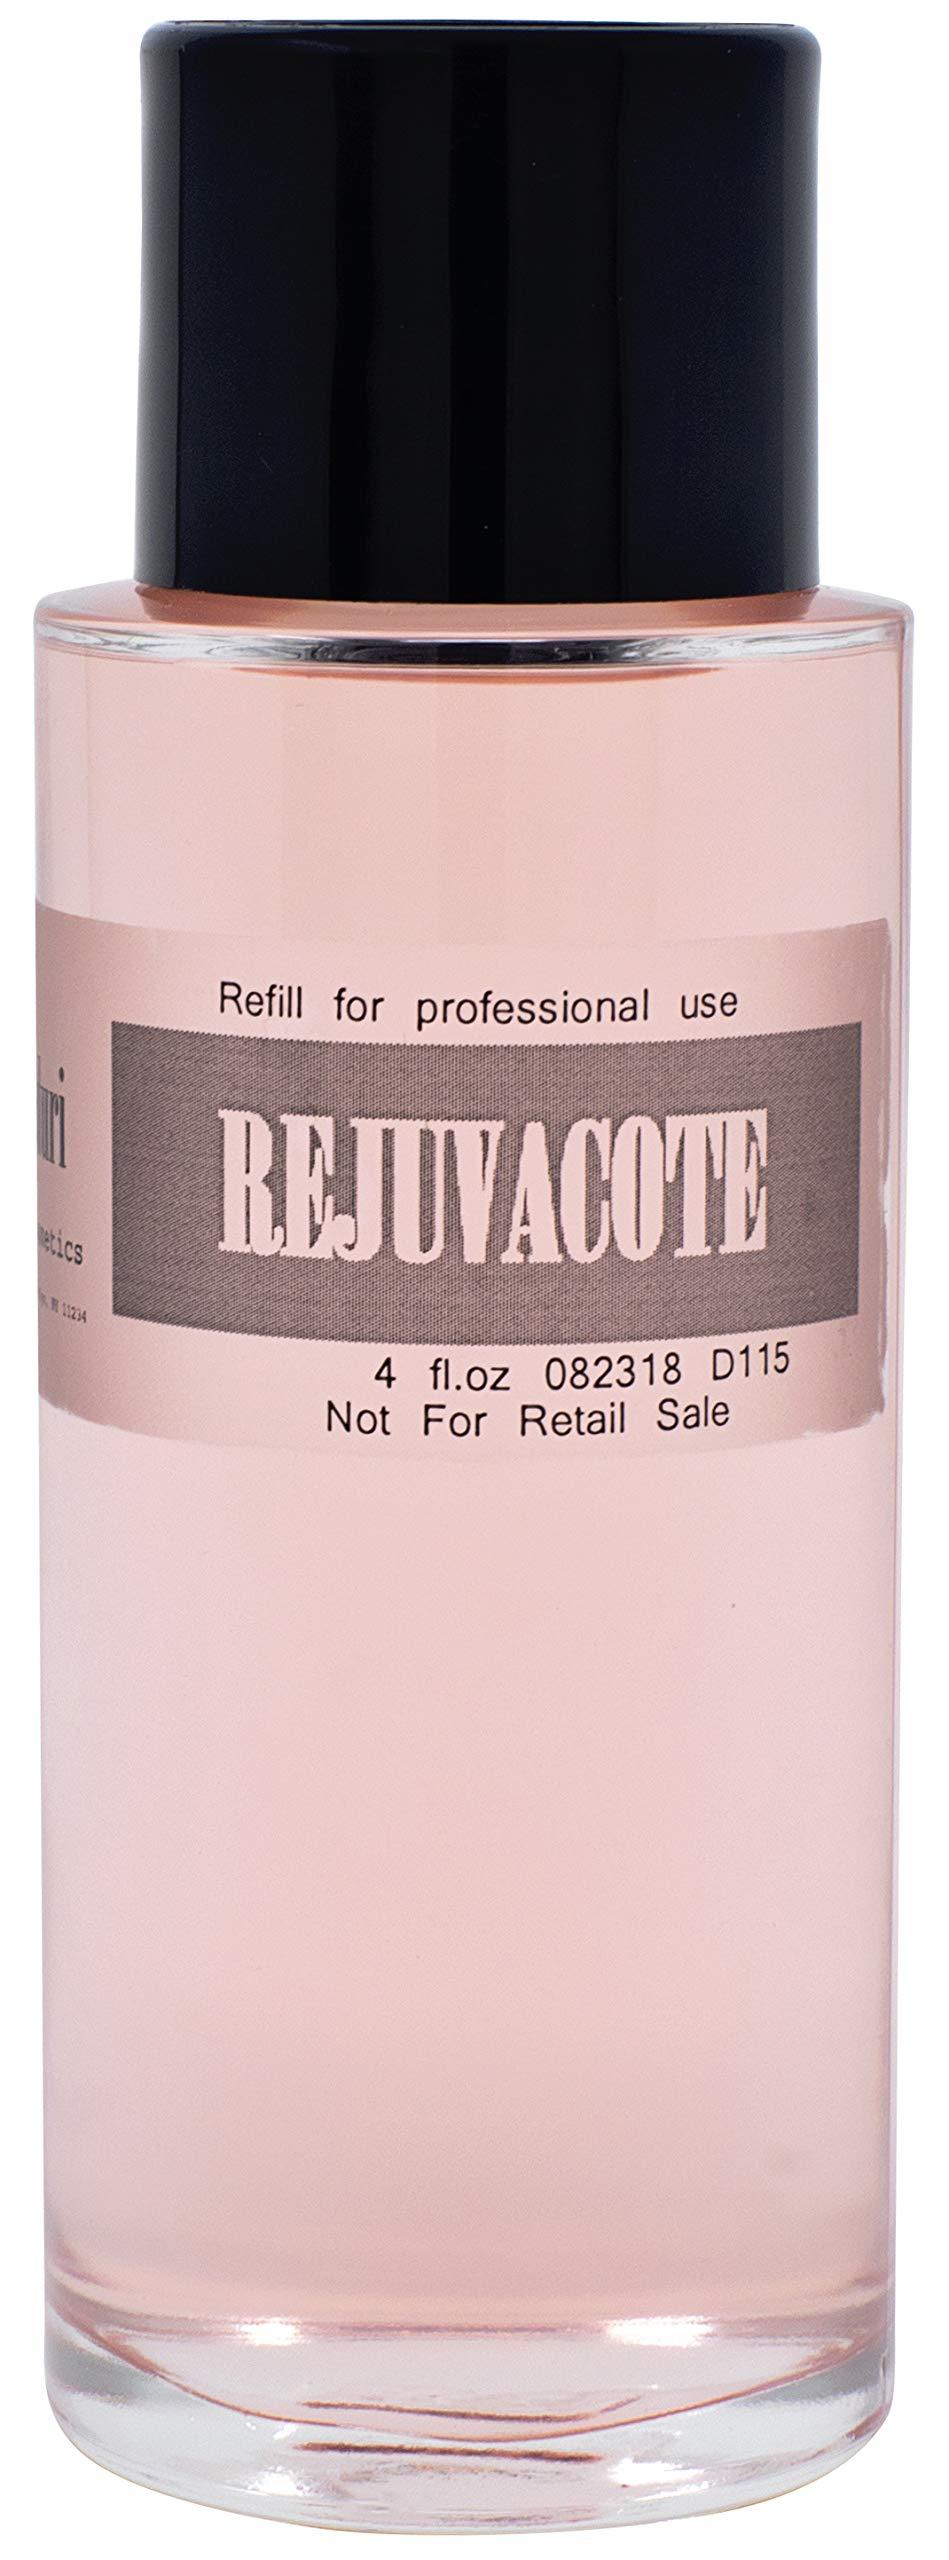 Duri Rejuvacote 1 Nail Growth System (Pick Your Size) (4 fl oz)